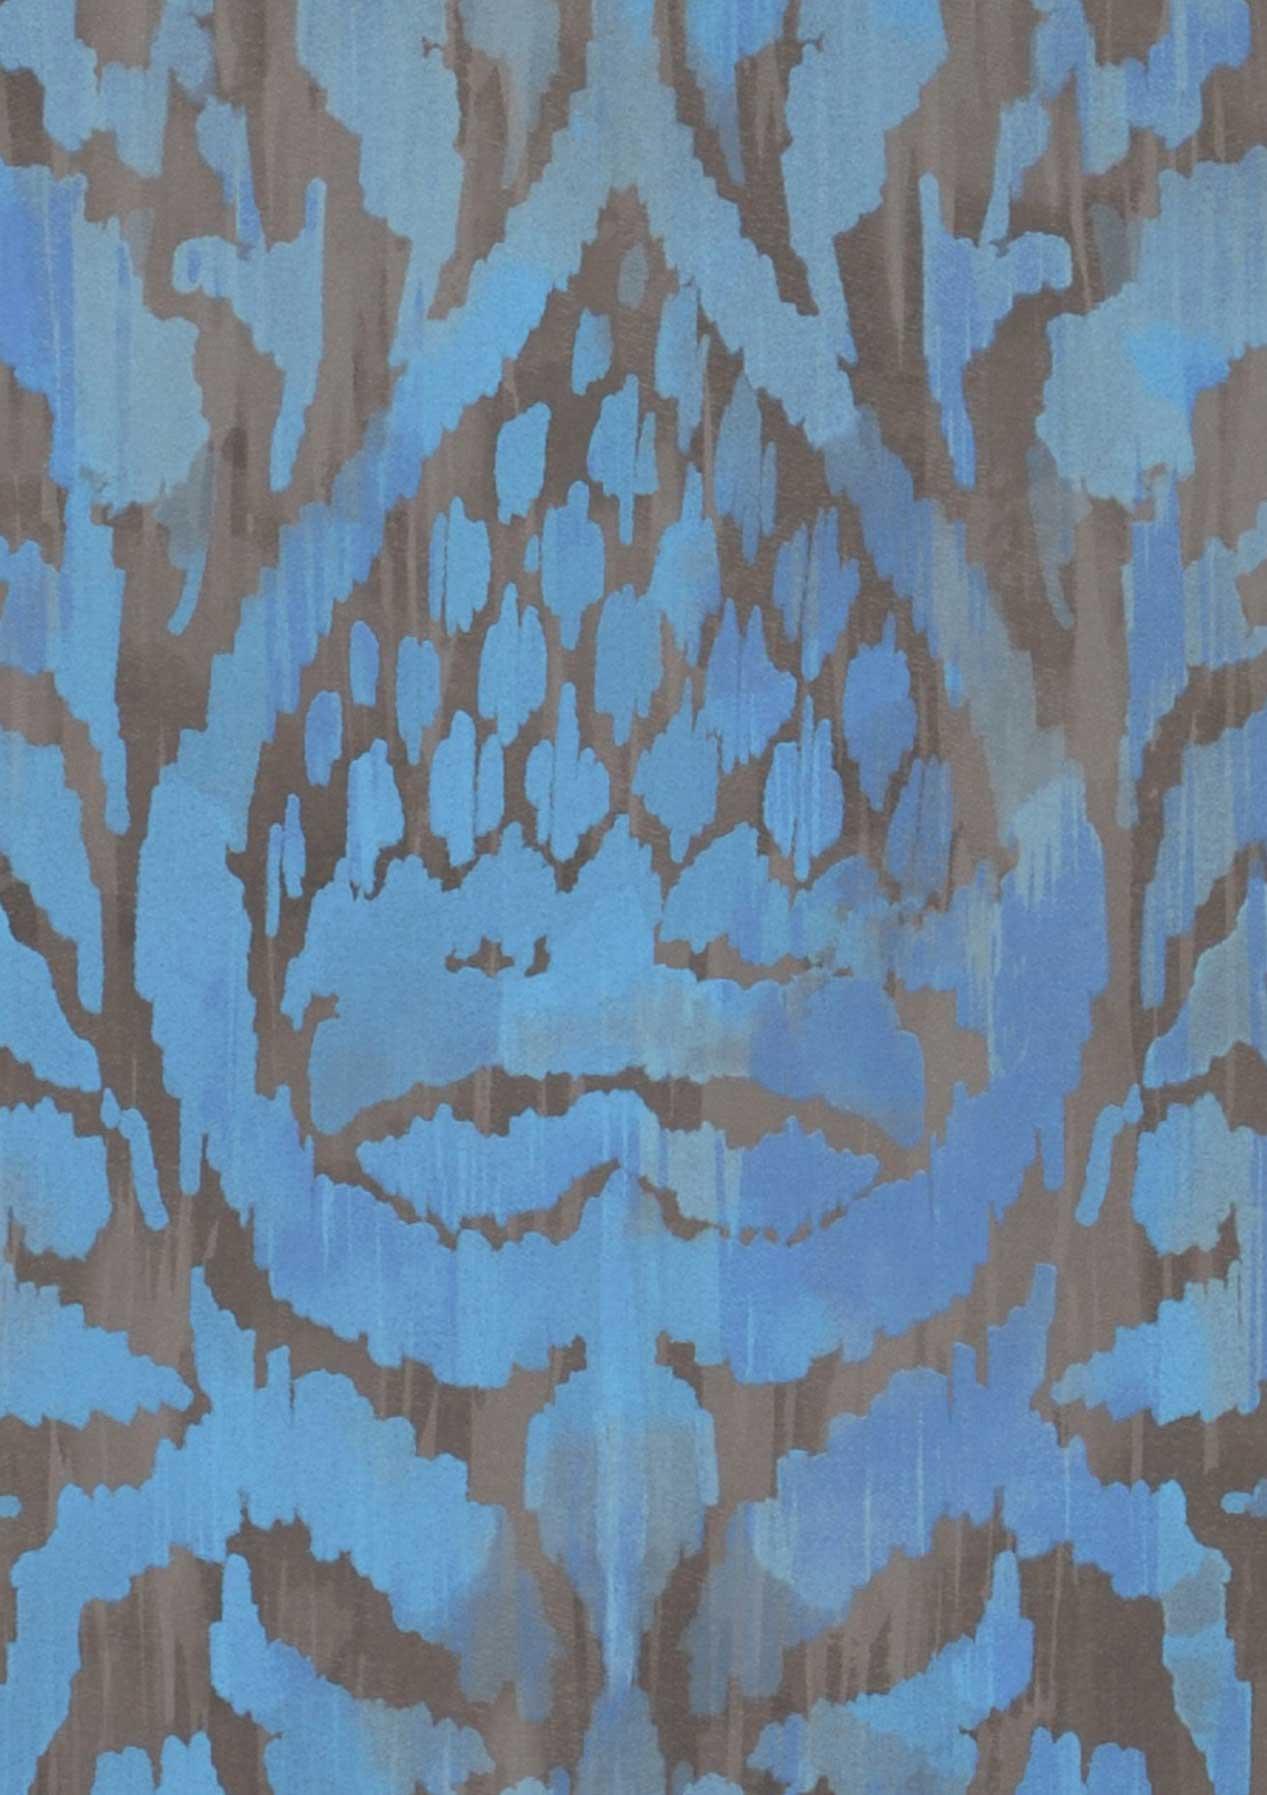 tapete esiko blassbraun graubraun brillantblau